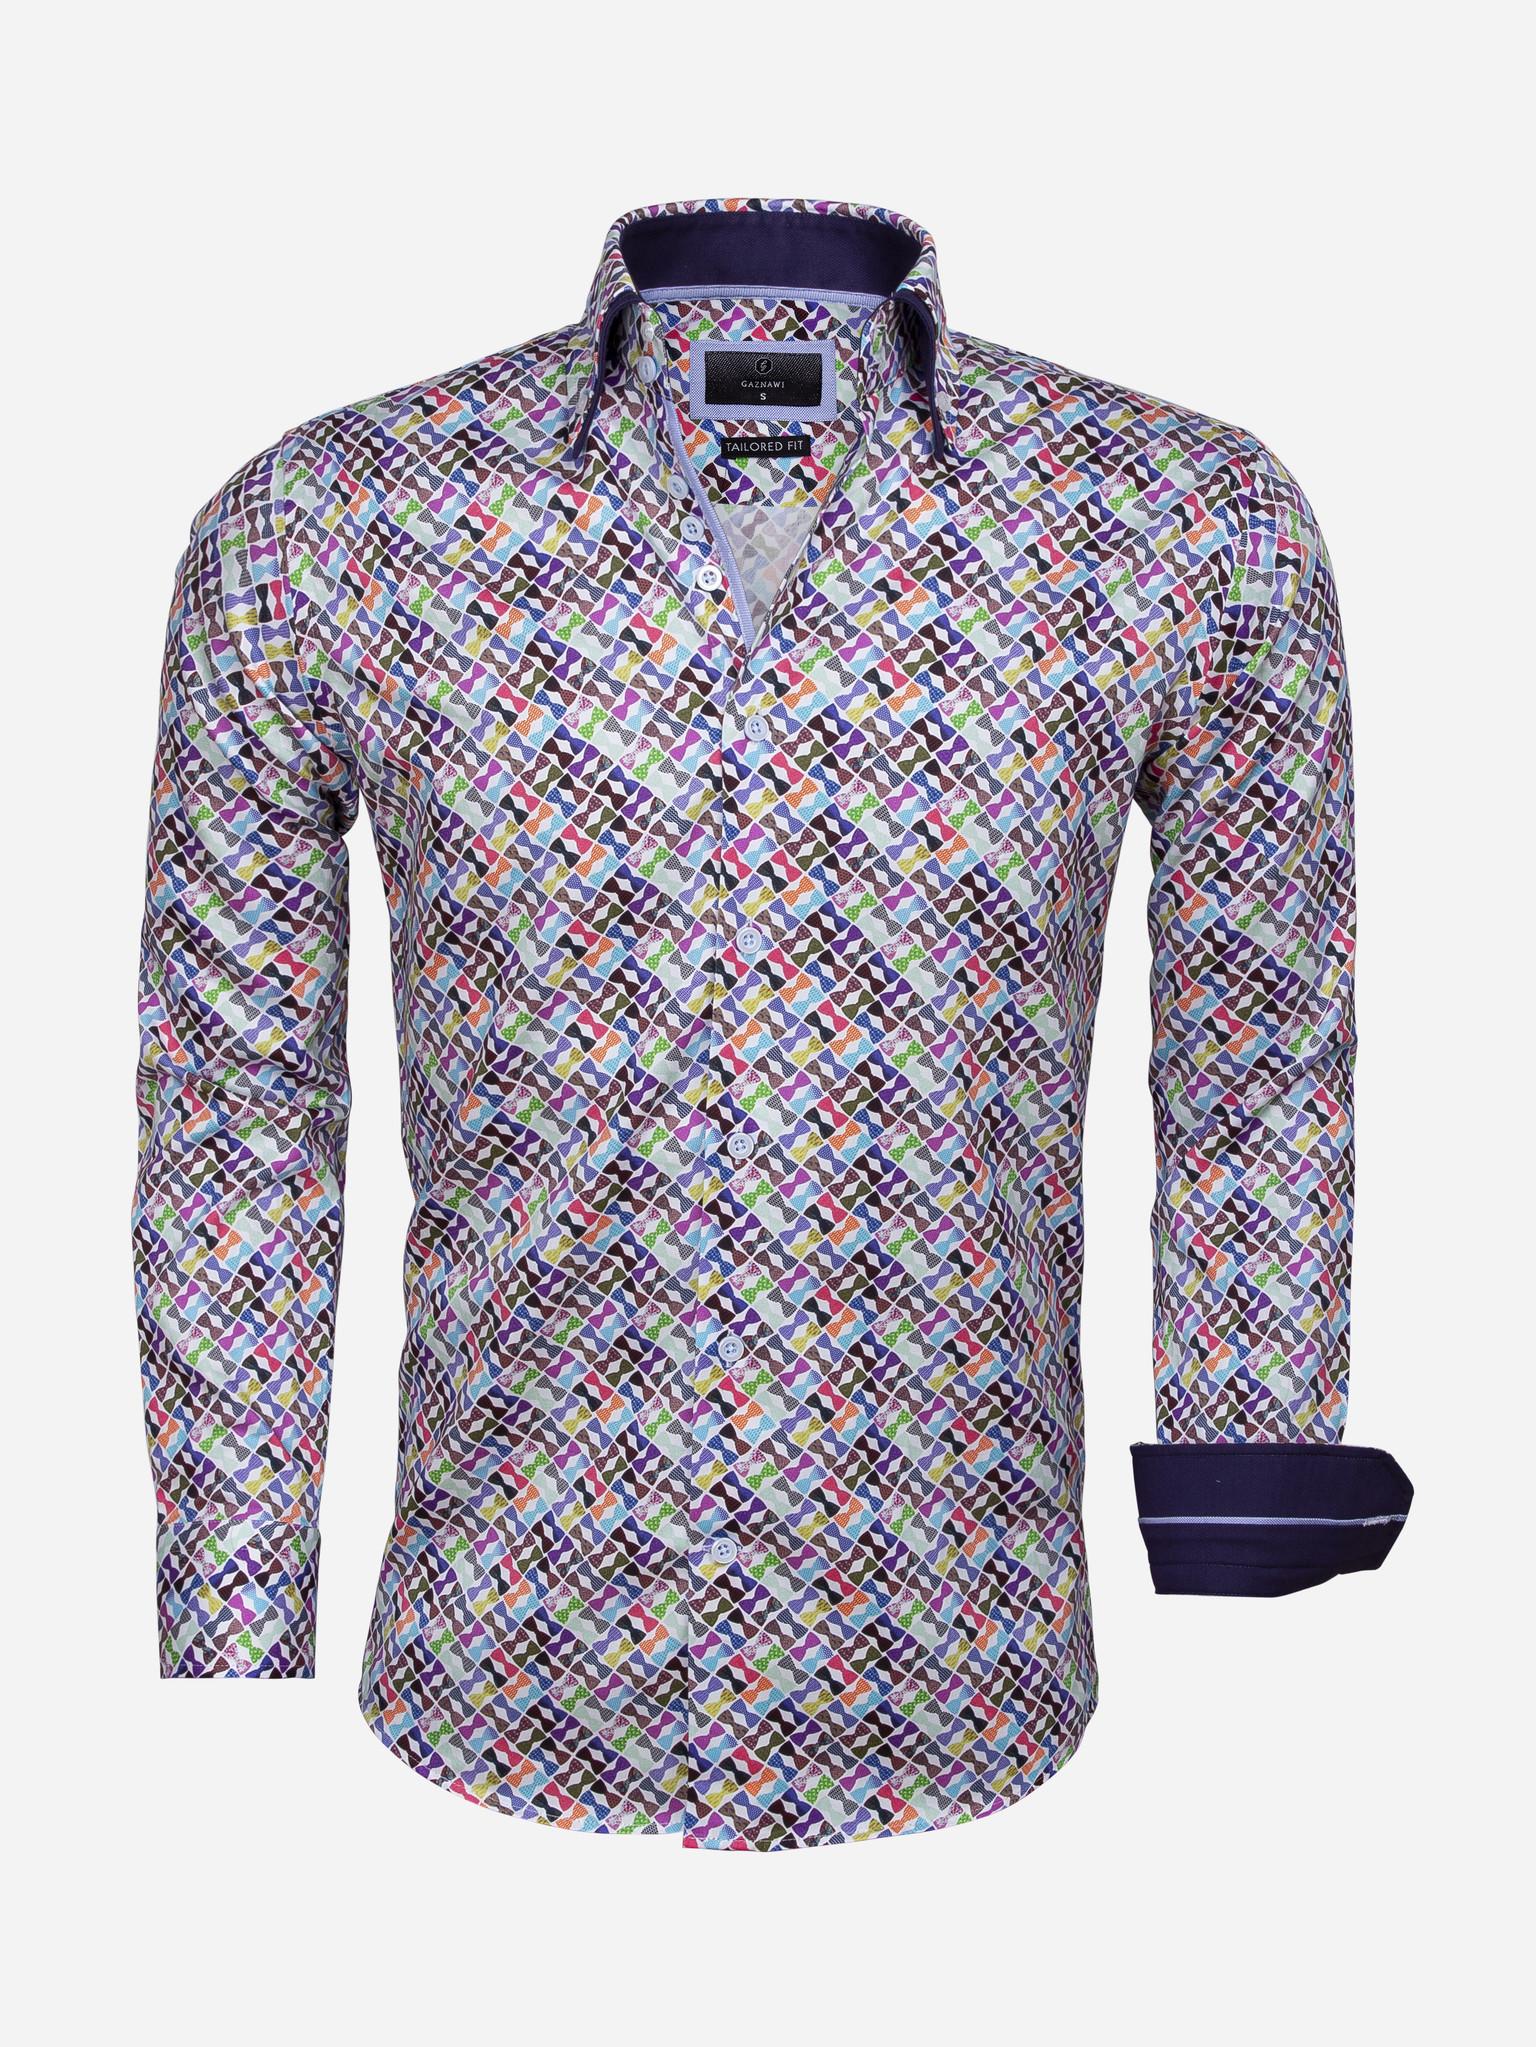 Gaznawi Overhemd Lange Mouw 65036 White Royal Blue Maat: 2XL